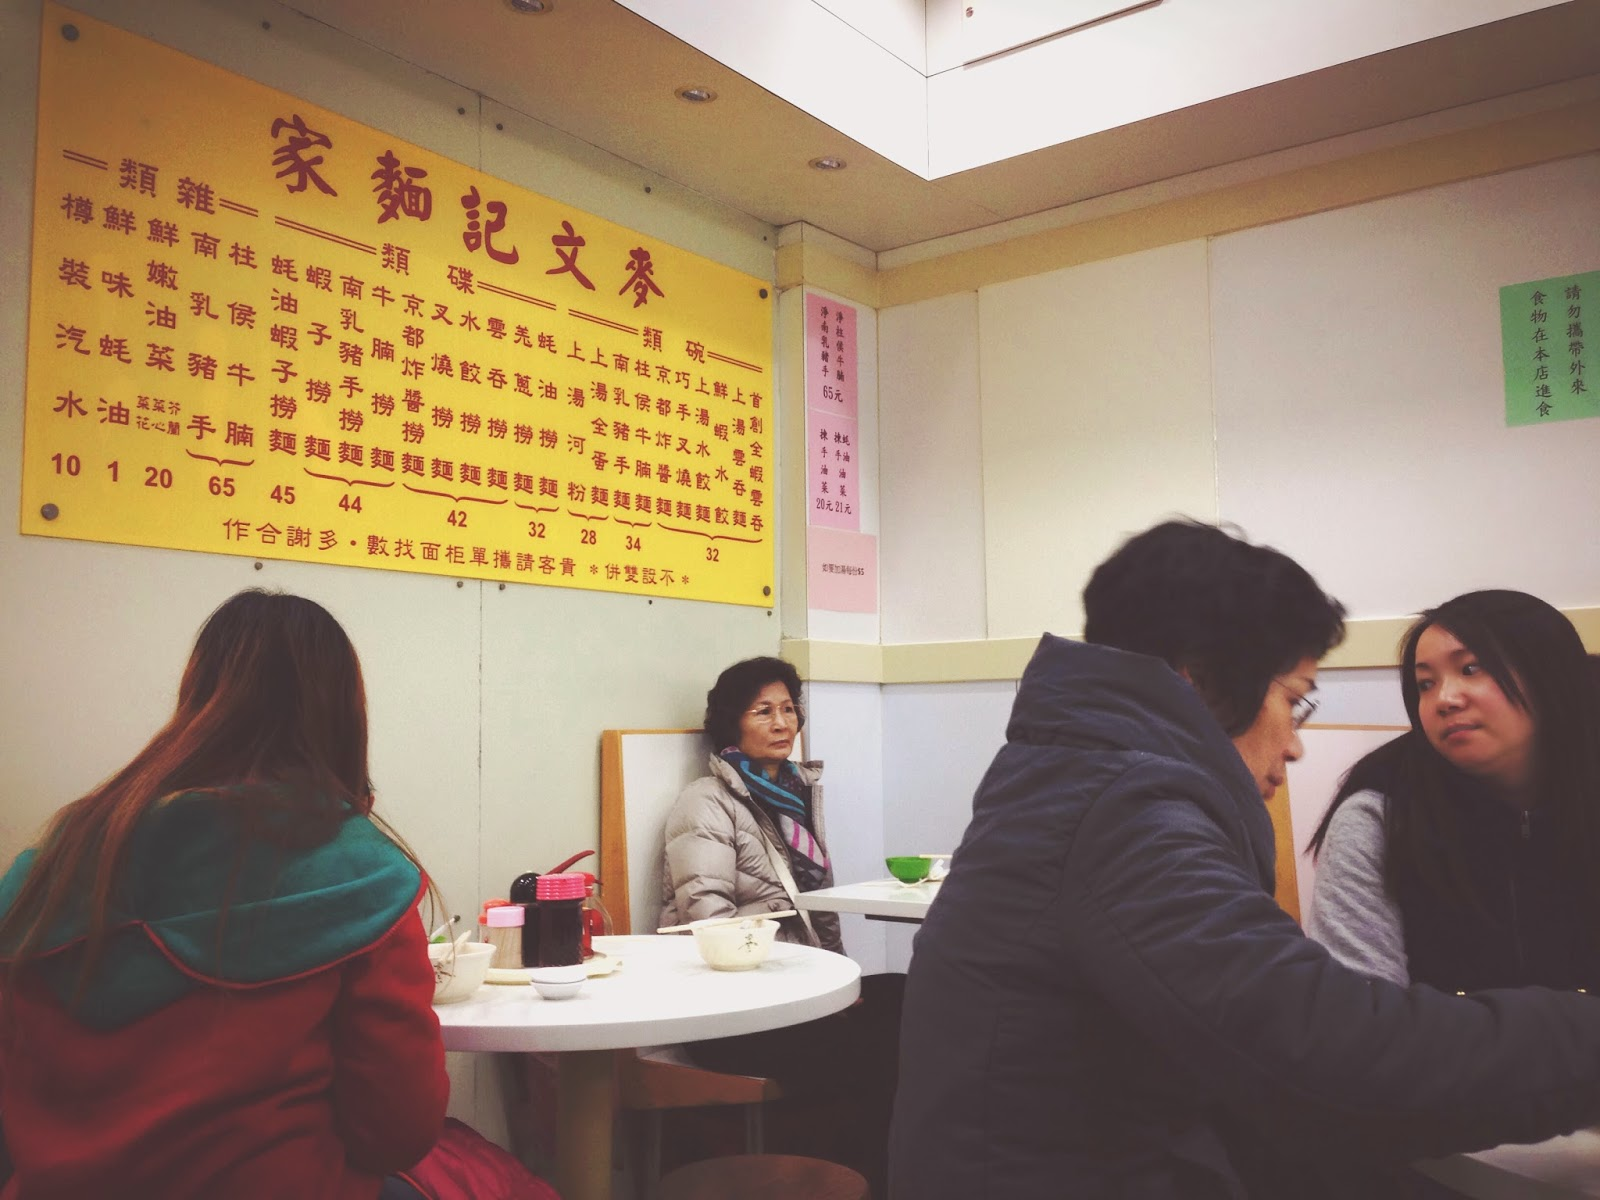 Mak Man Kee Noodle Shop Menu Parkes St, Jordan, Hong Kong